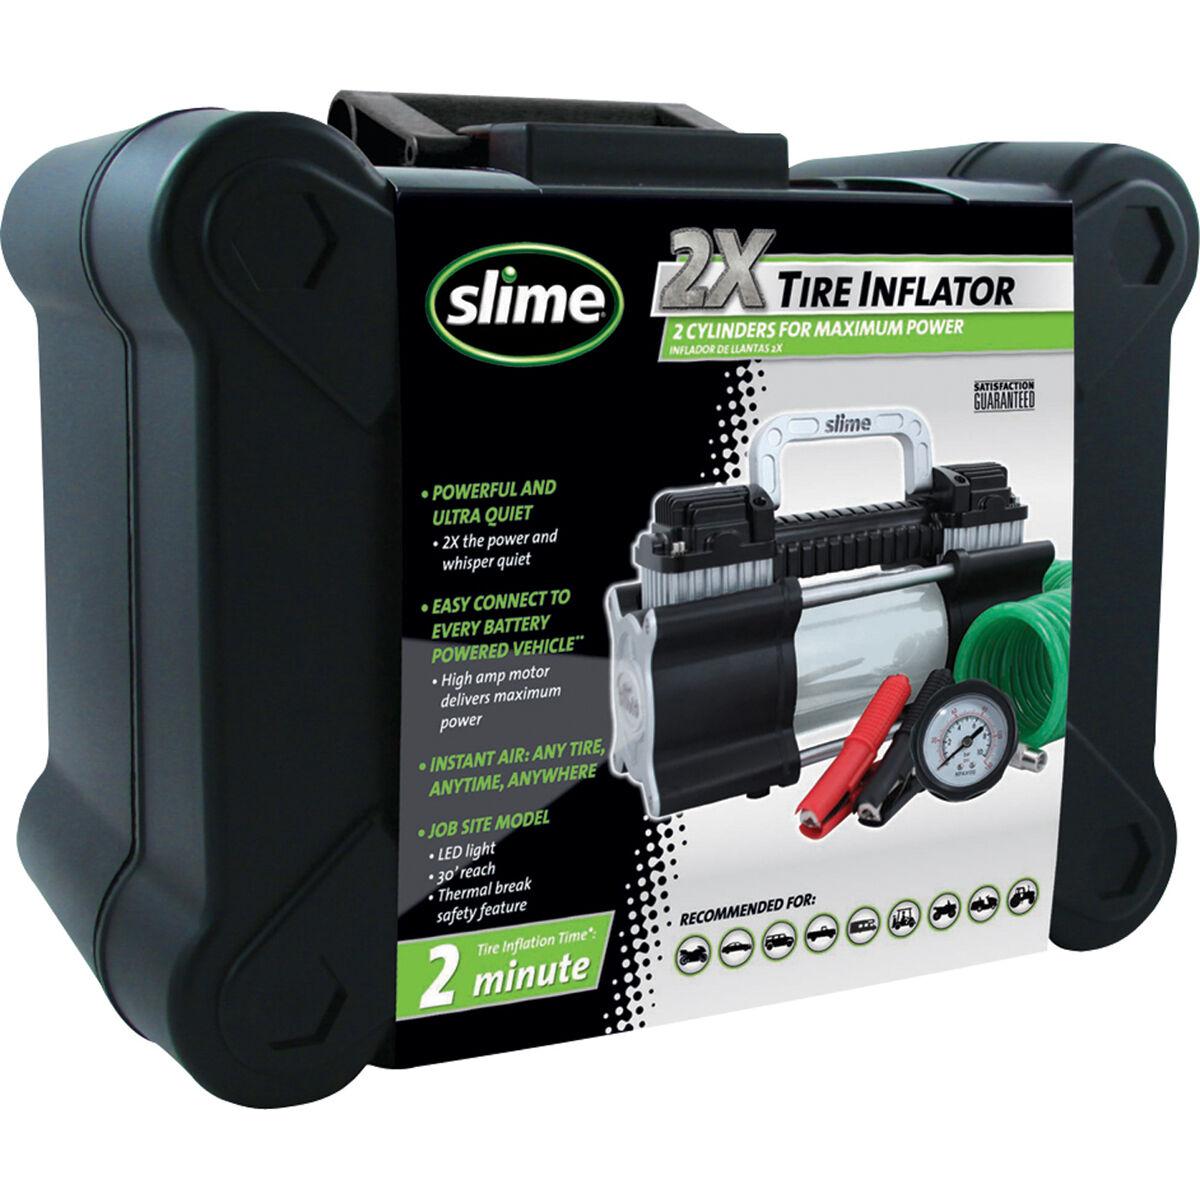 hight resolution of slime air compressor 2x pro series 12v bcf hi res